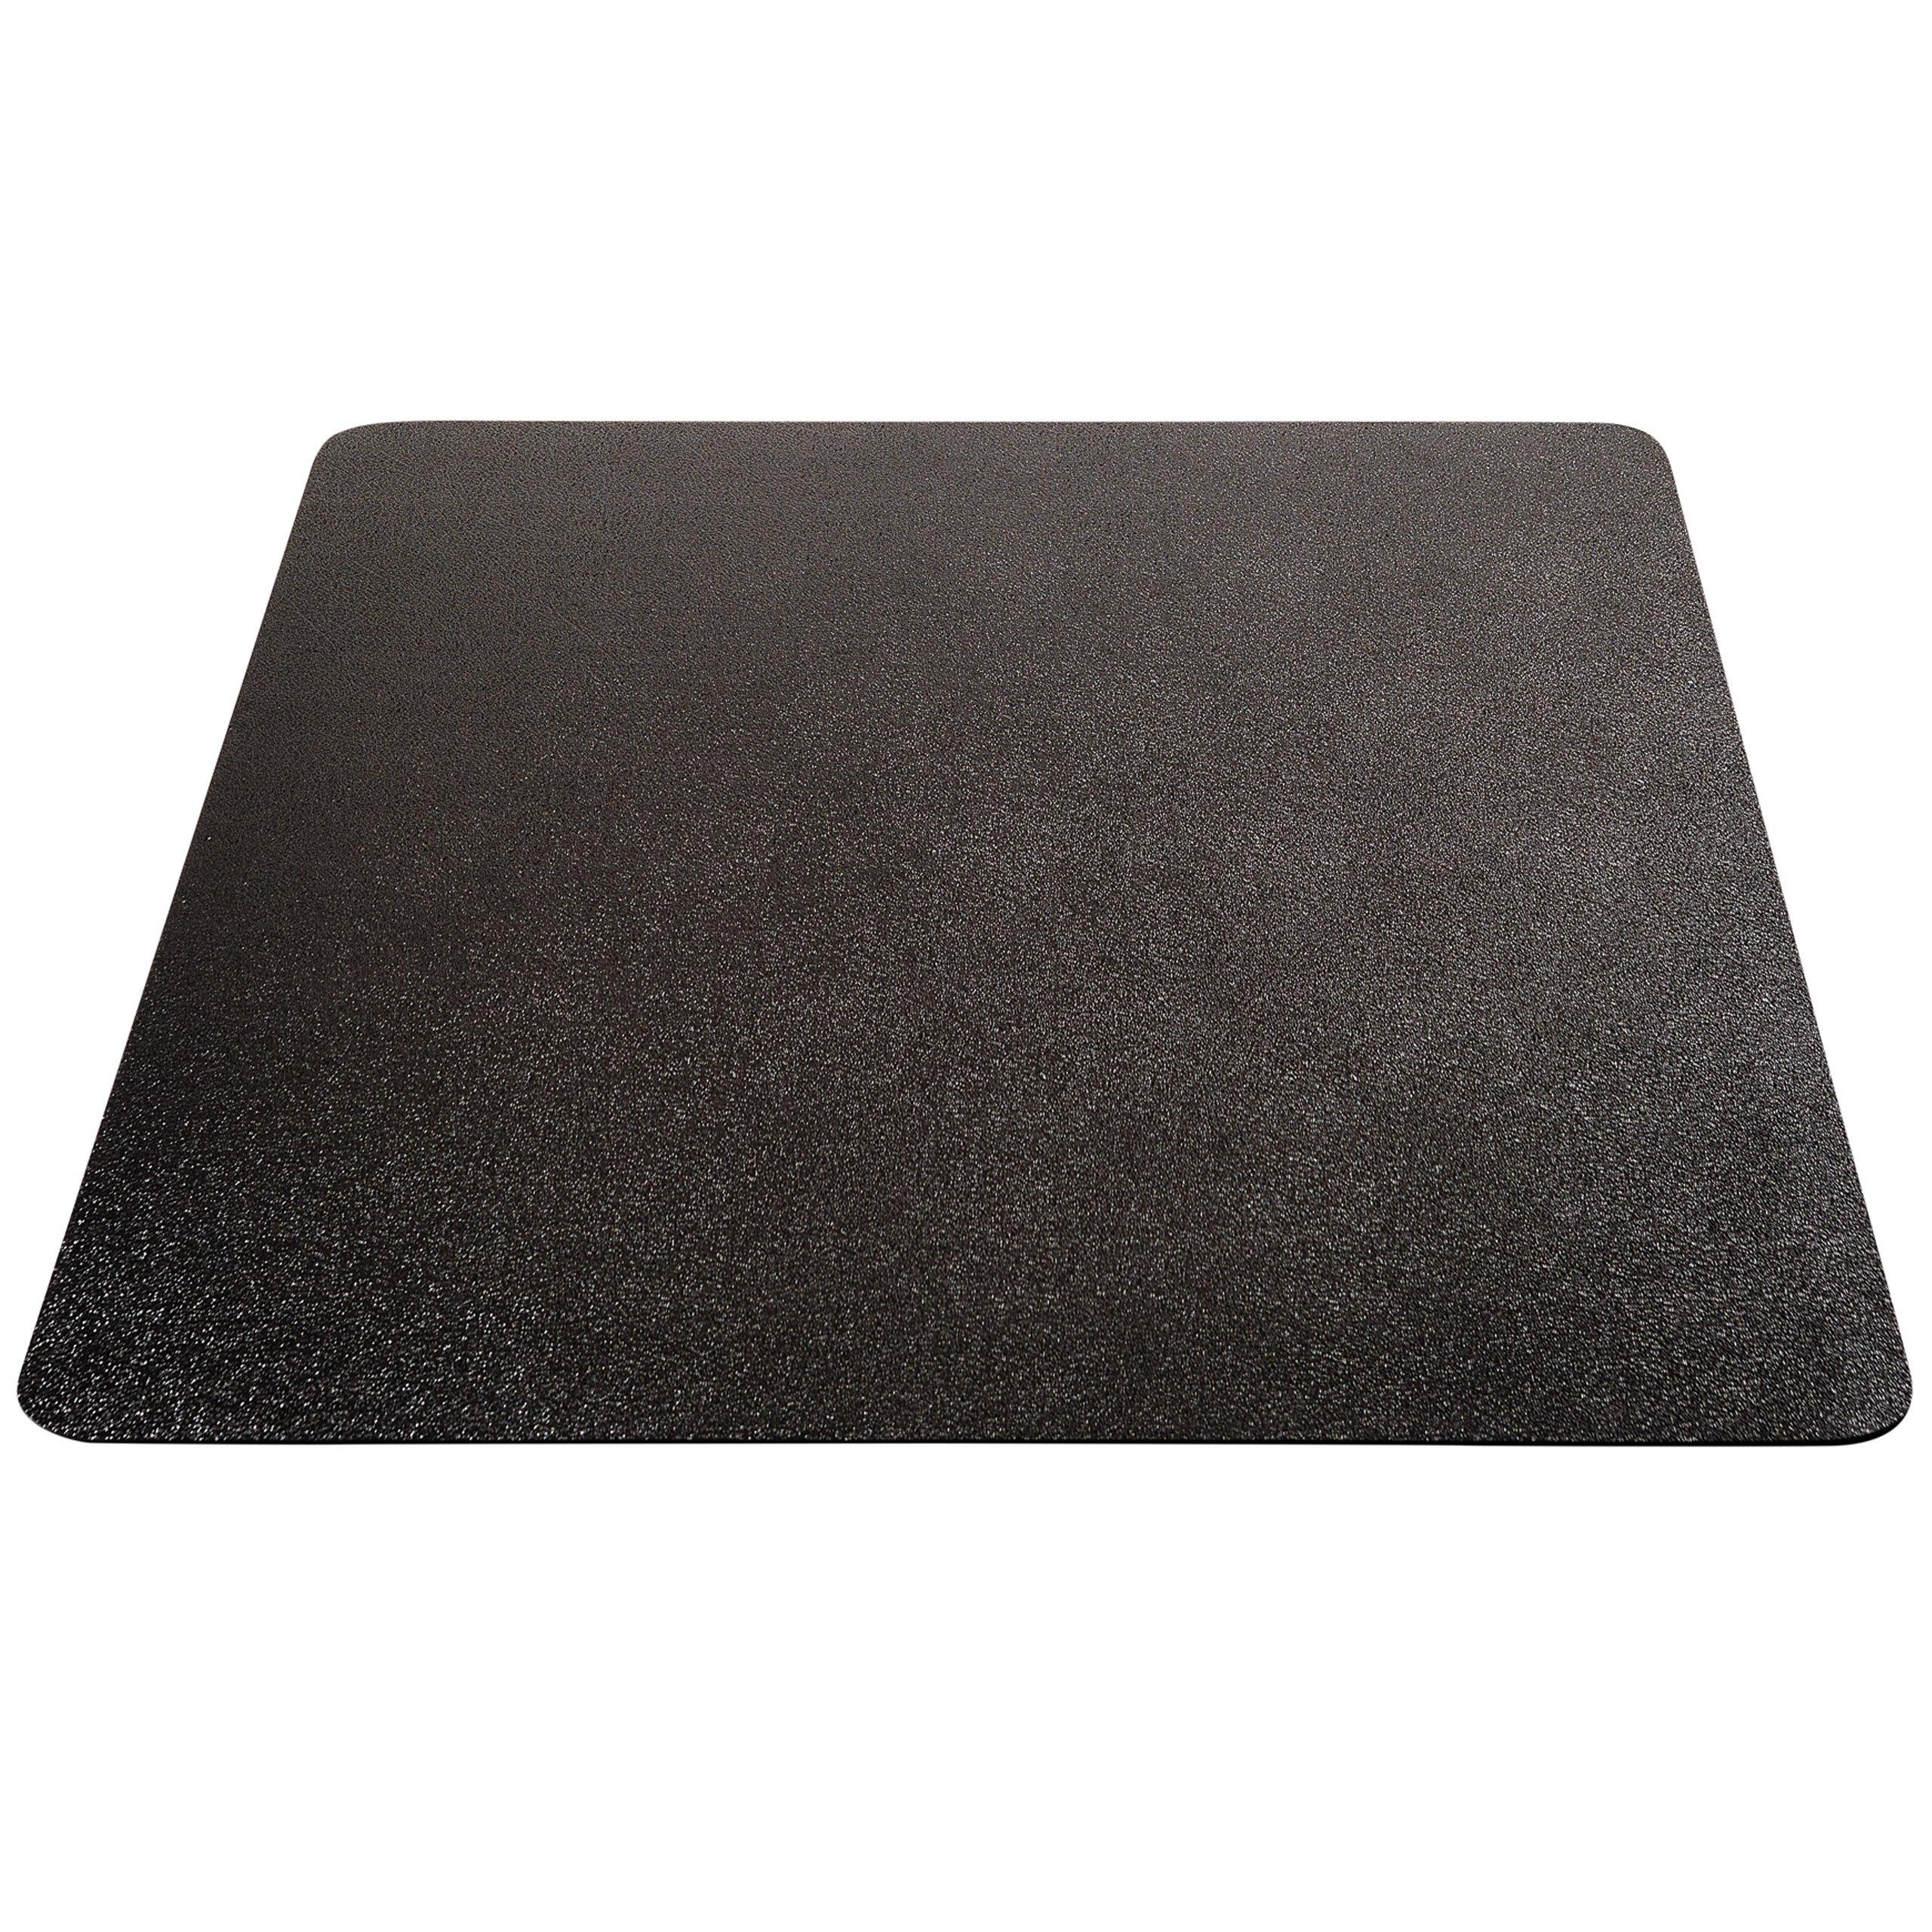 Deflecto EconoMat Black Chair Mat, Low Pile Carpet Use, Rectangle, Straight Edge, 45 x 53 Inches (CM11242BLKCOM)